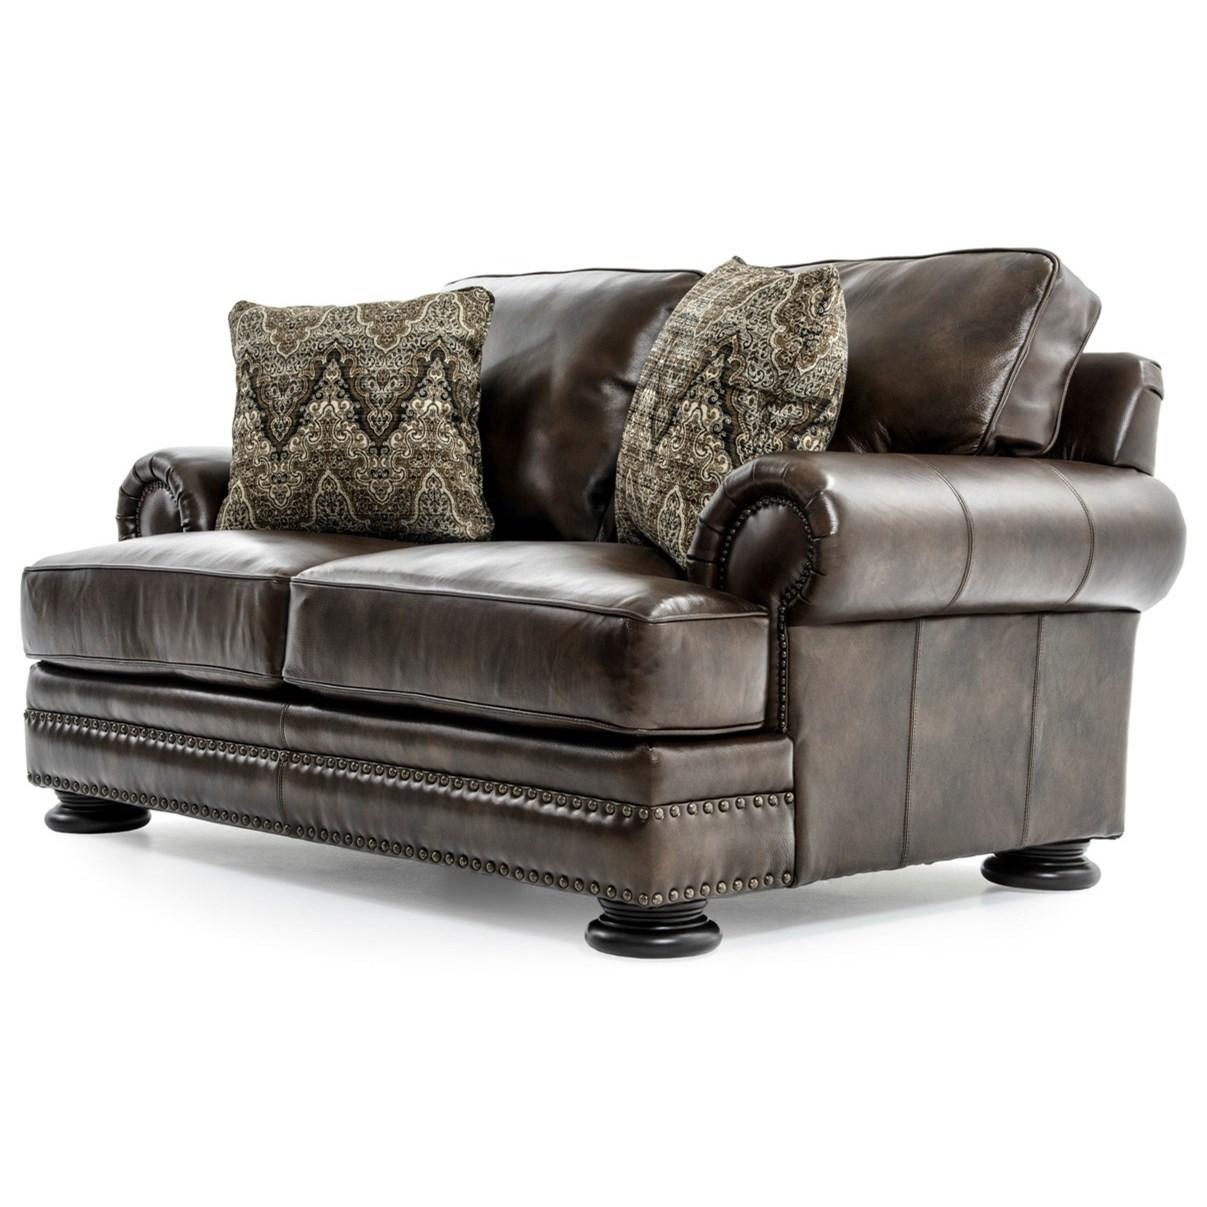 Bernhardt Foster 5175l Loveseat Baer S Furniture Love